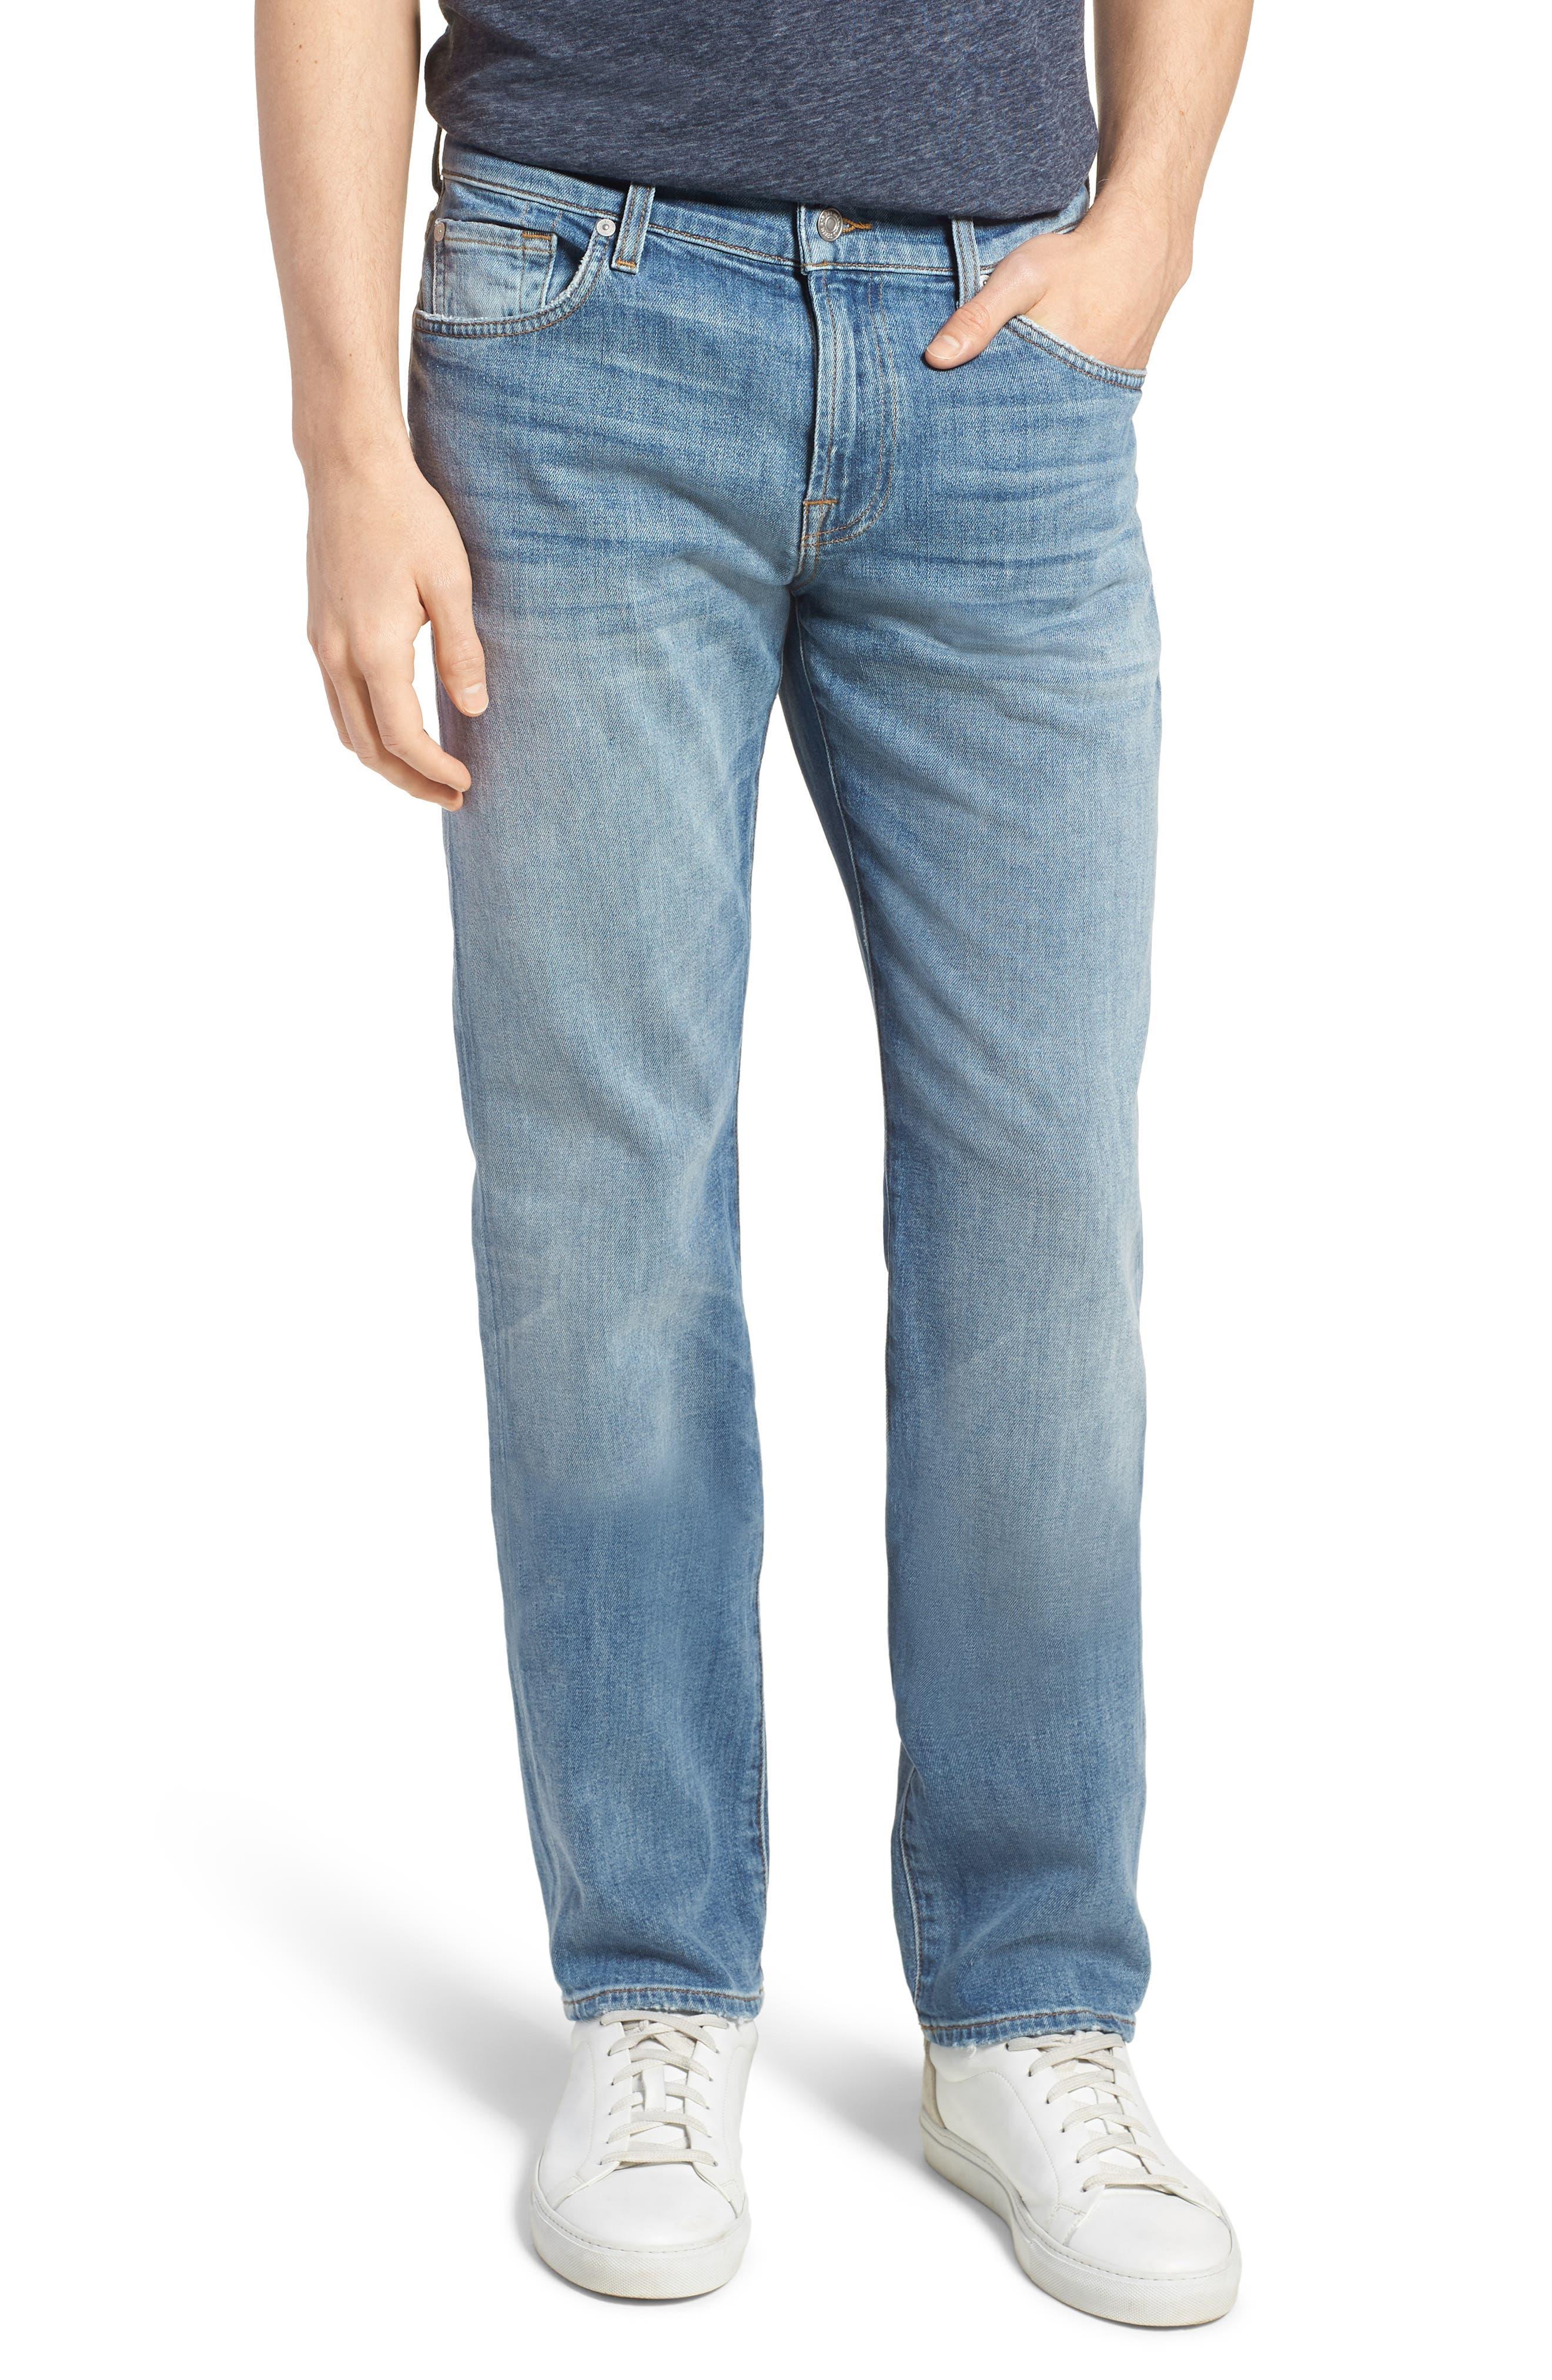 Slimmy Slim Fit Jeans,                         Main,                         color, 400